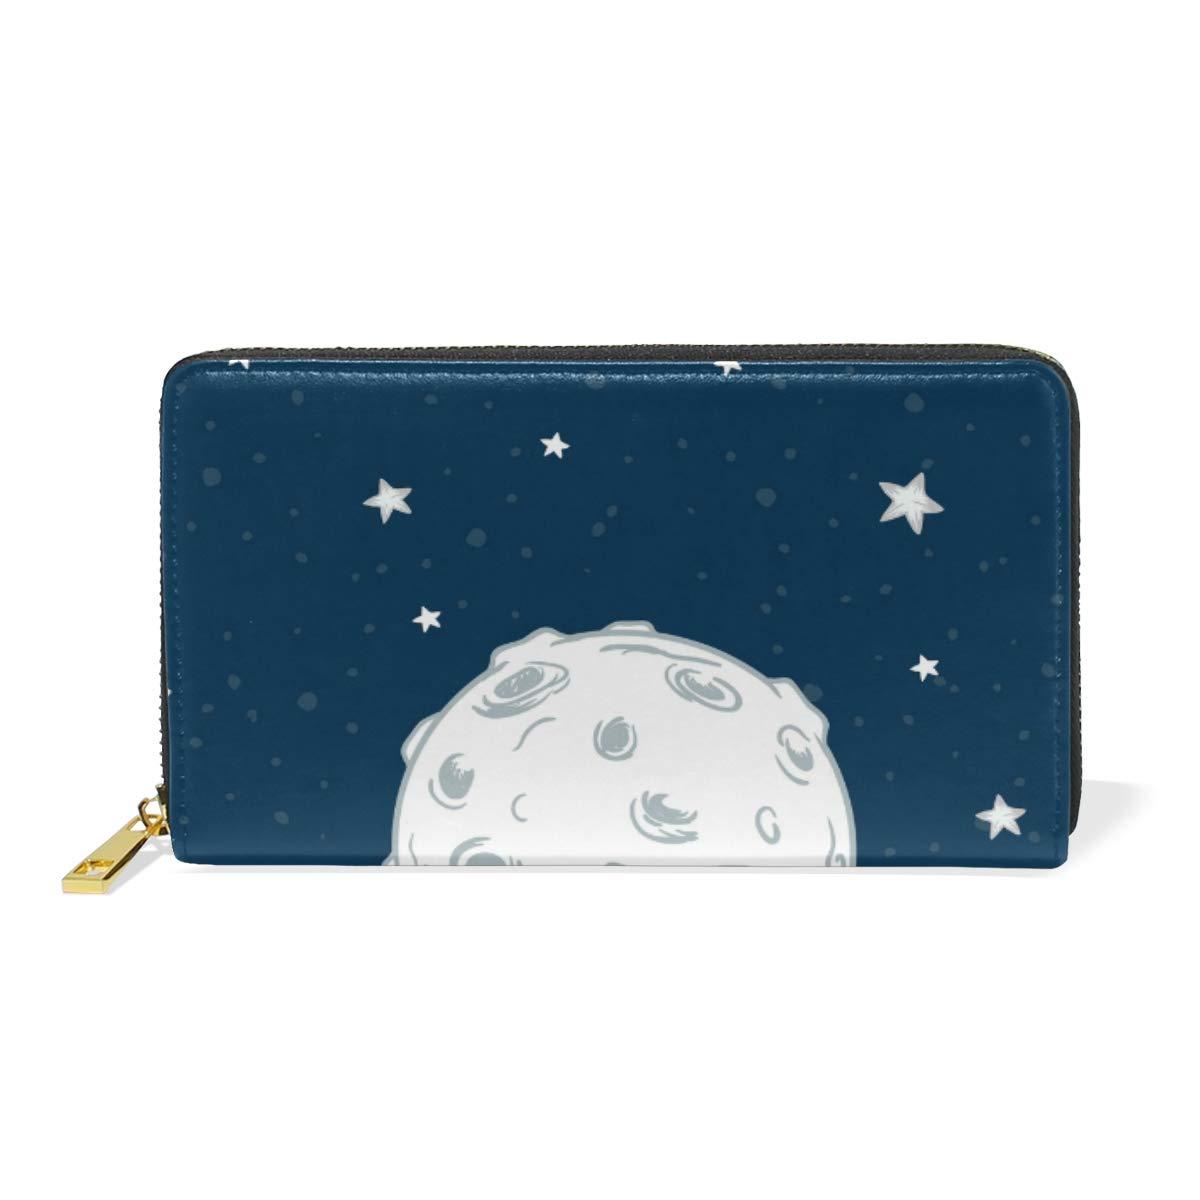 Women Wallet Coin Purse Phone Clutch Pouch Cash Bag Female Girl Card Change Holder Organizer Storage Key Hold Leather Elegant Handbag Party Birthday Gift Moon Stars